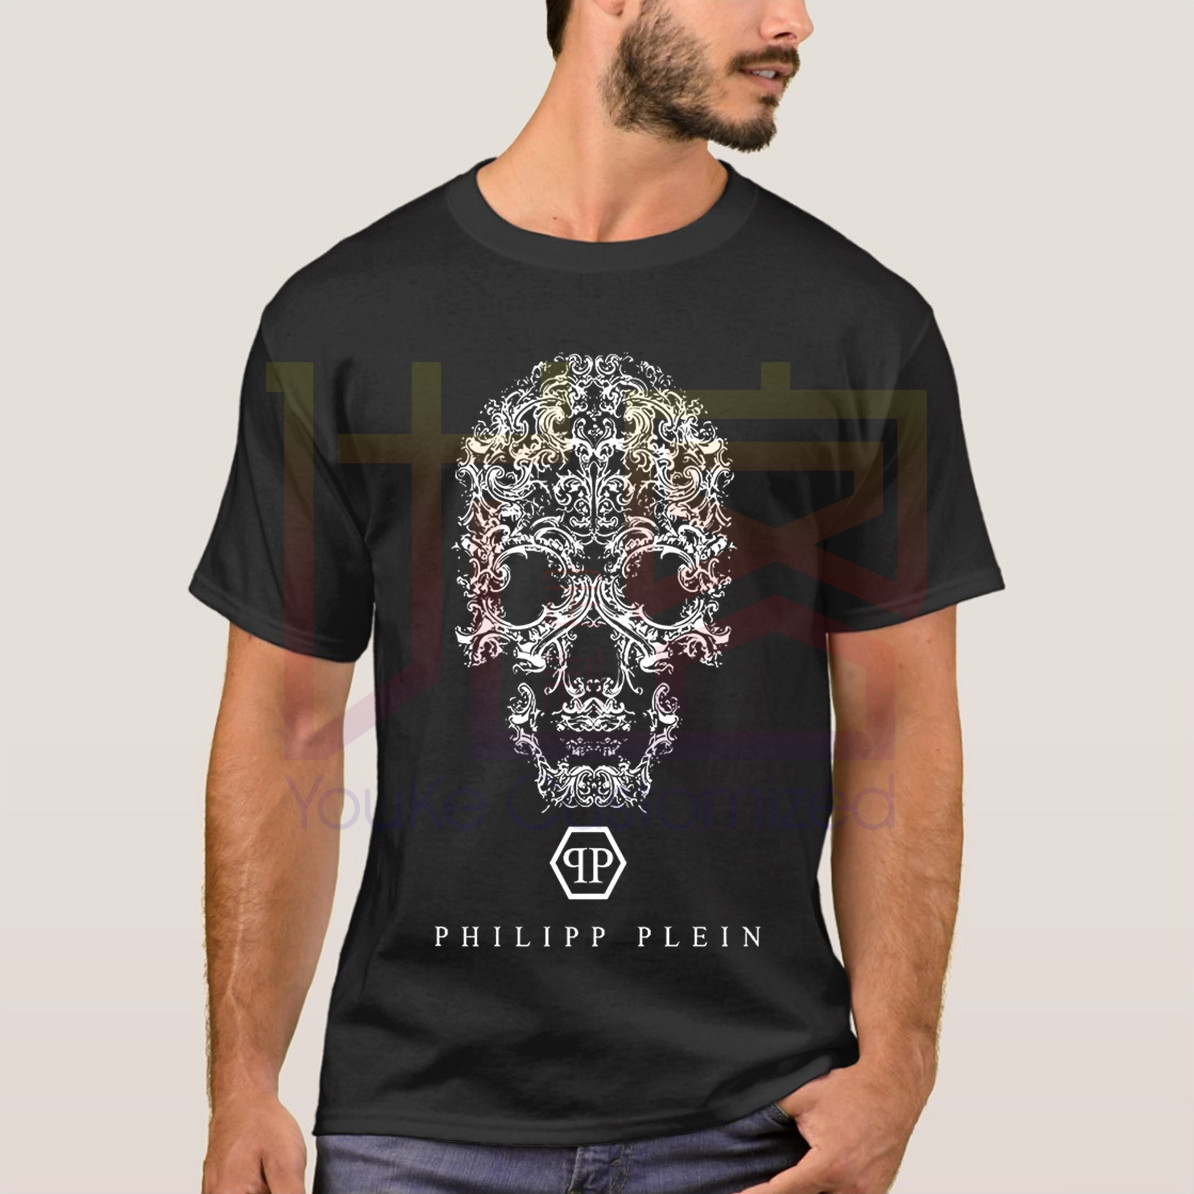 Retro Phillip Plein Skull Graphic Creative T-Shirt Casual Men's Short Sleeve T-Shirt Streetwear